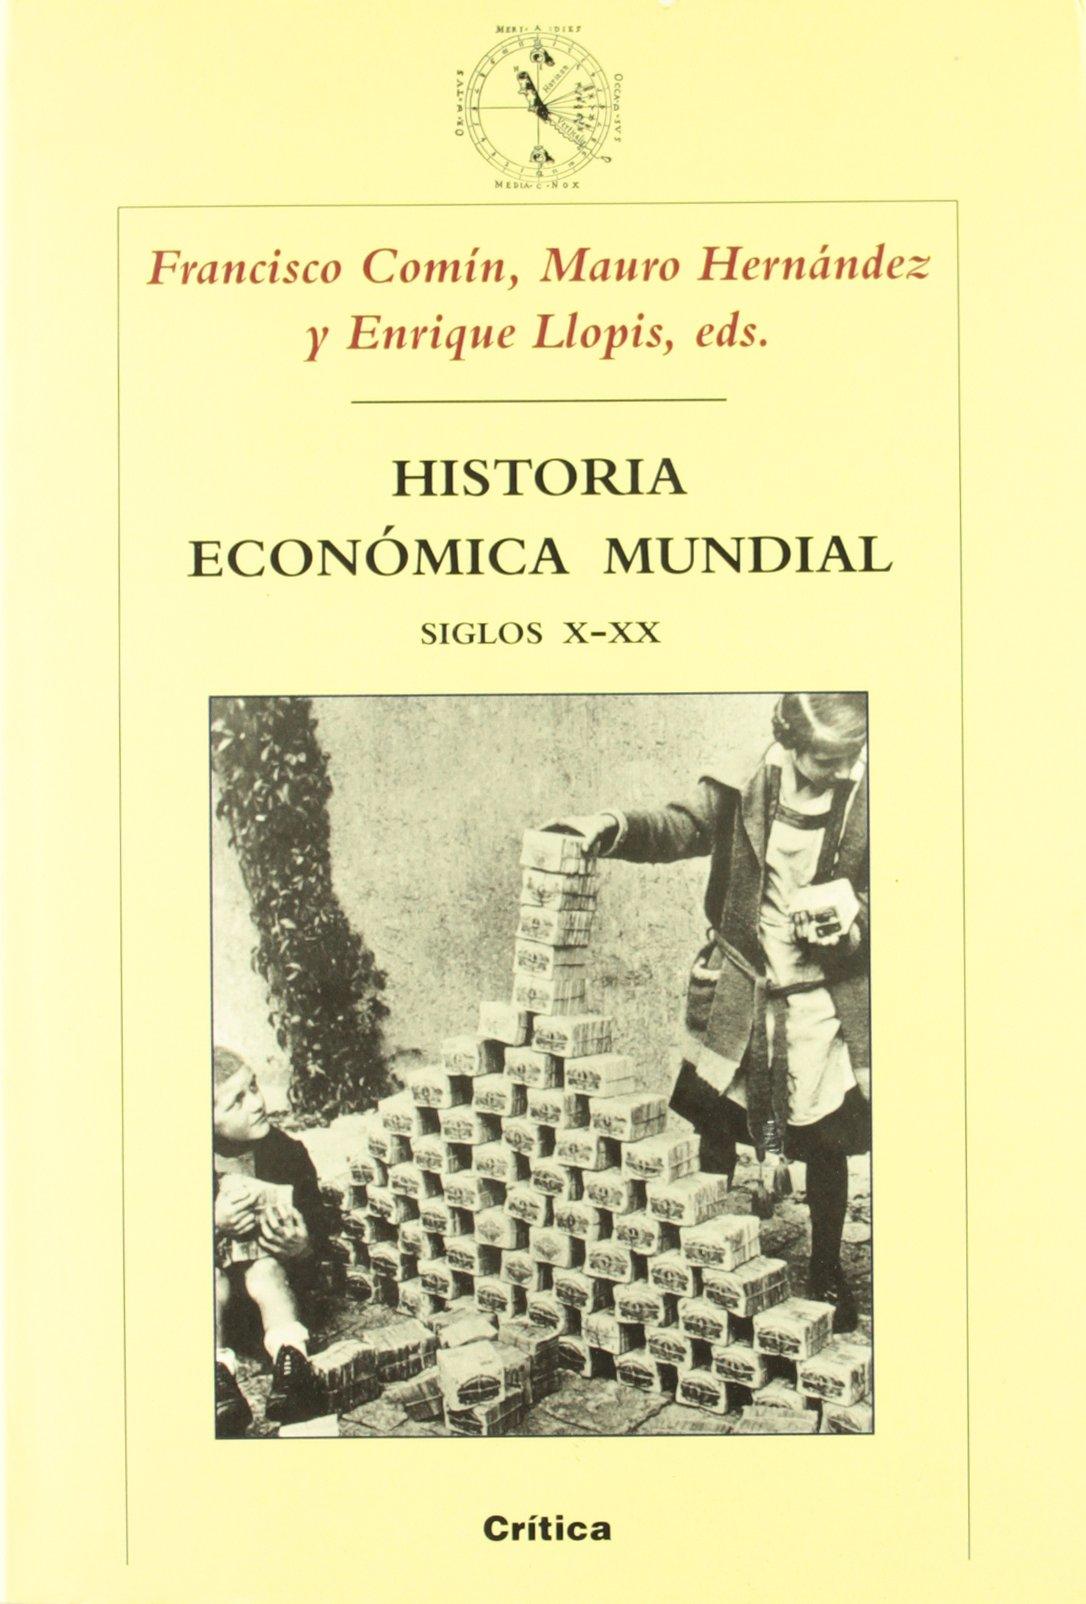 Historia económica mundial, siglos X-XX Crítica/Historia del Mundo ...